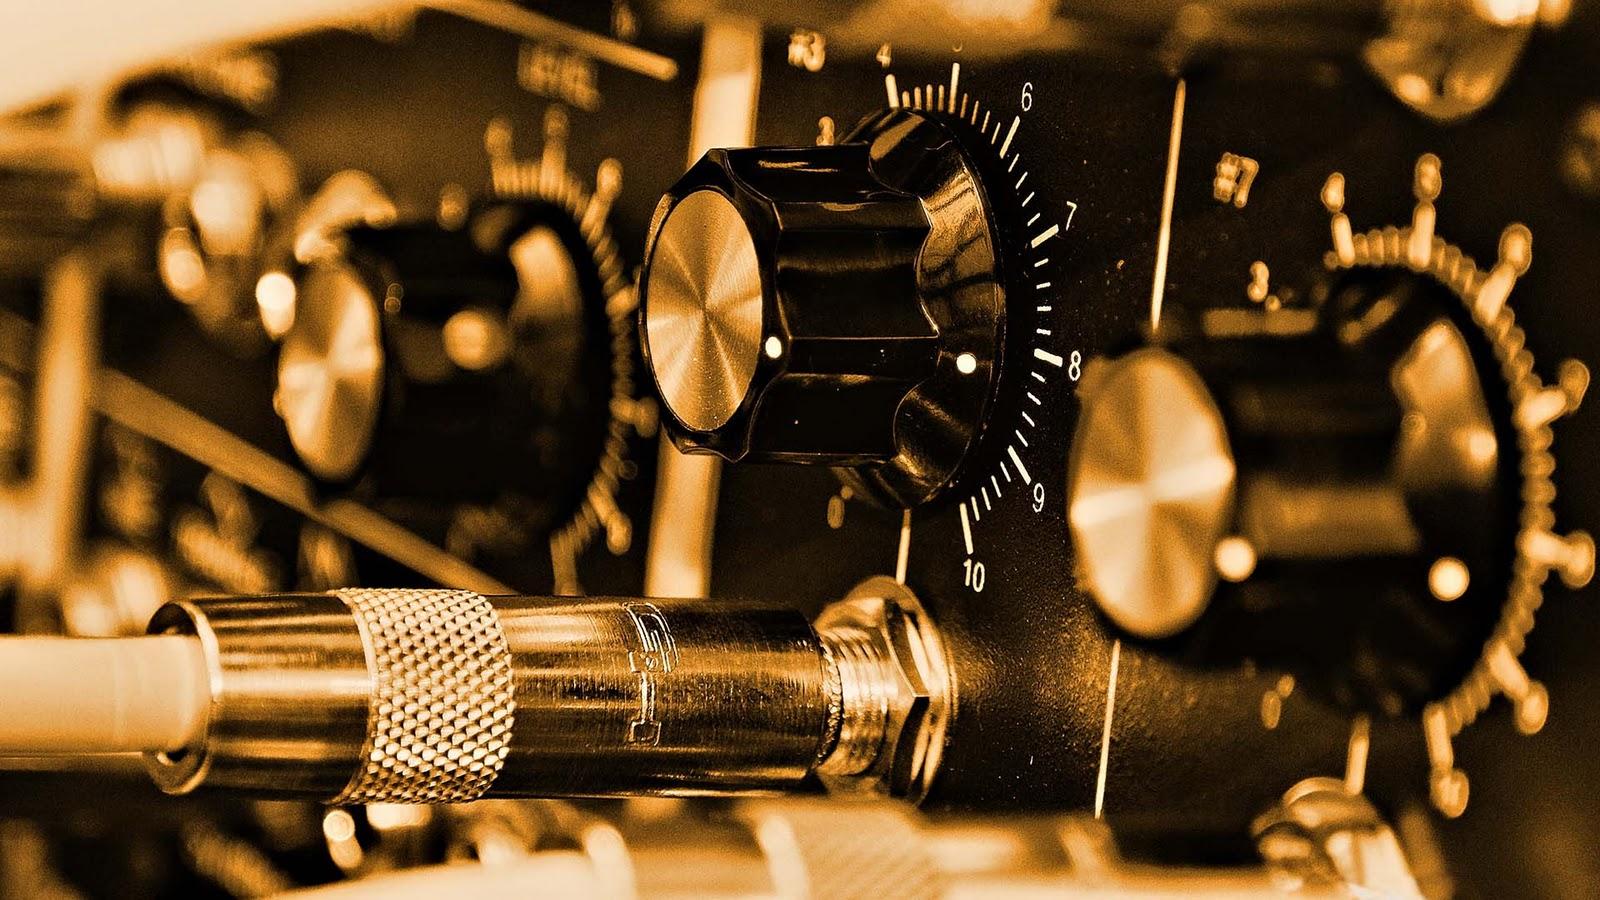 Amplifier Controls Music Desktop HD Wallpaper 1920x1080 1600x900